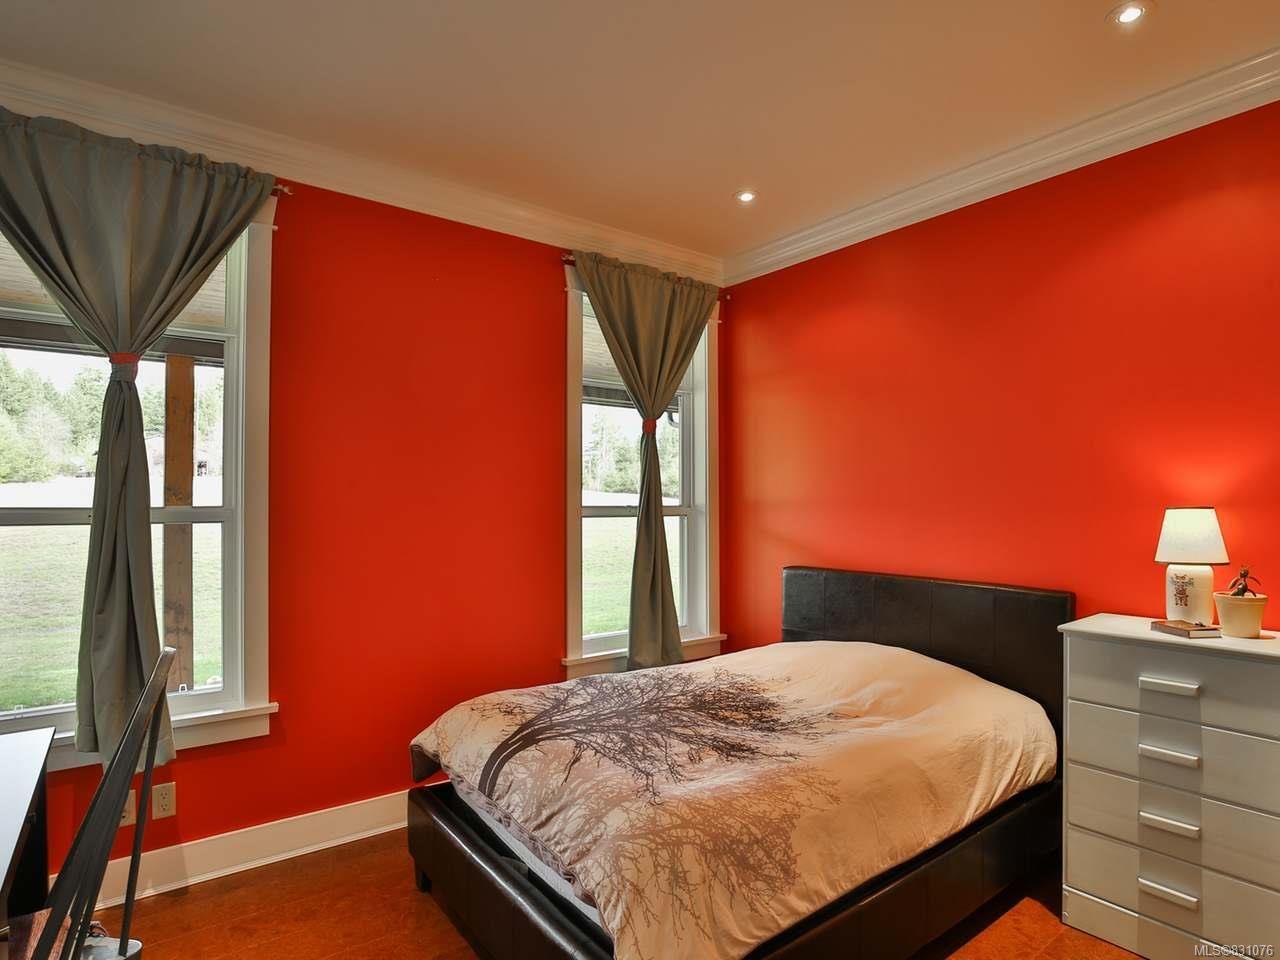 Photo 21: Photos: 6159 Strathcona St in PORT ALBERNI: PA Alberni Valley House for sale (Port Alberni)  : MLS®# 831076